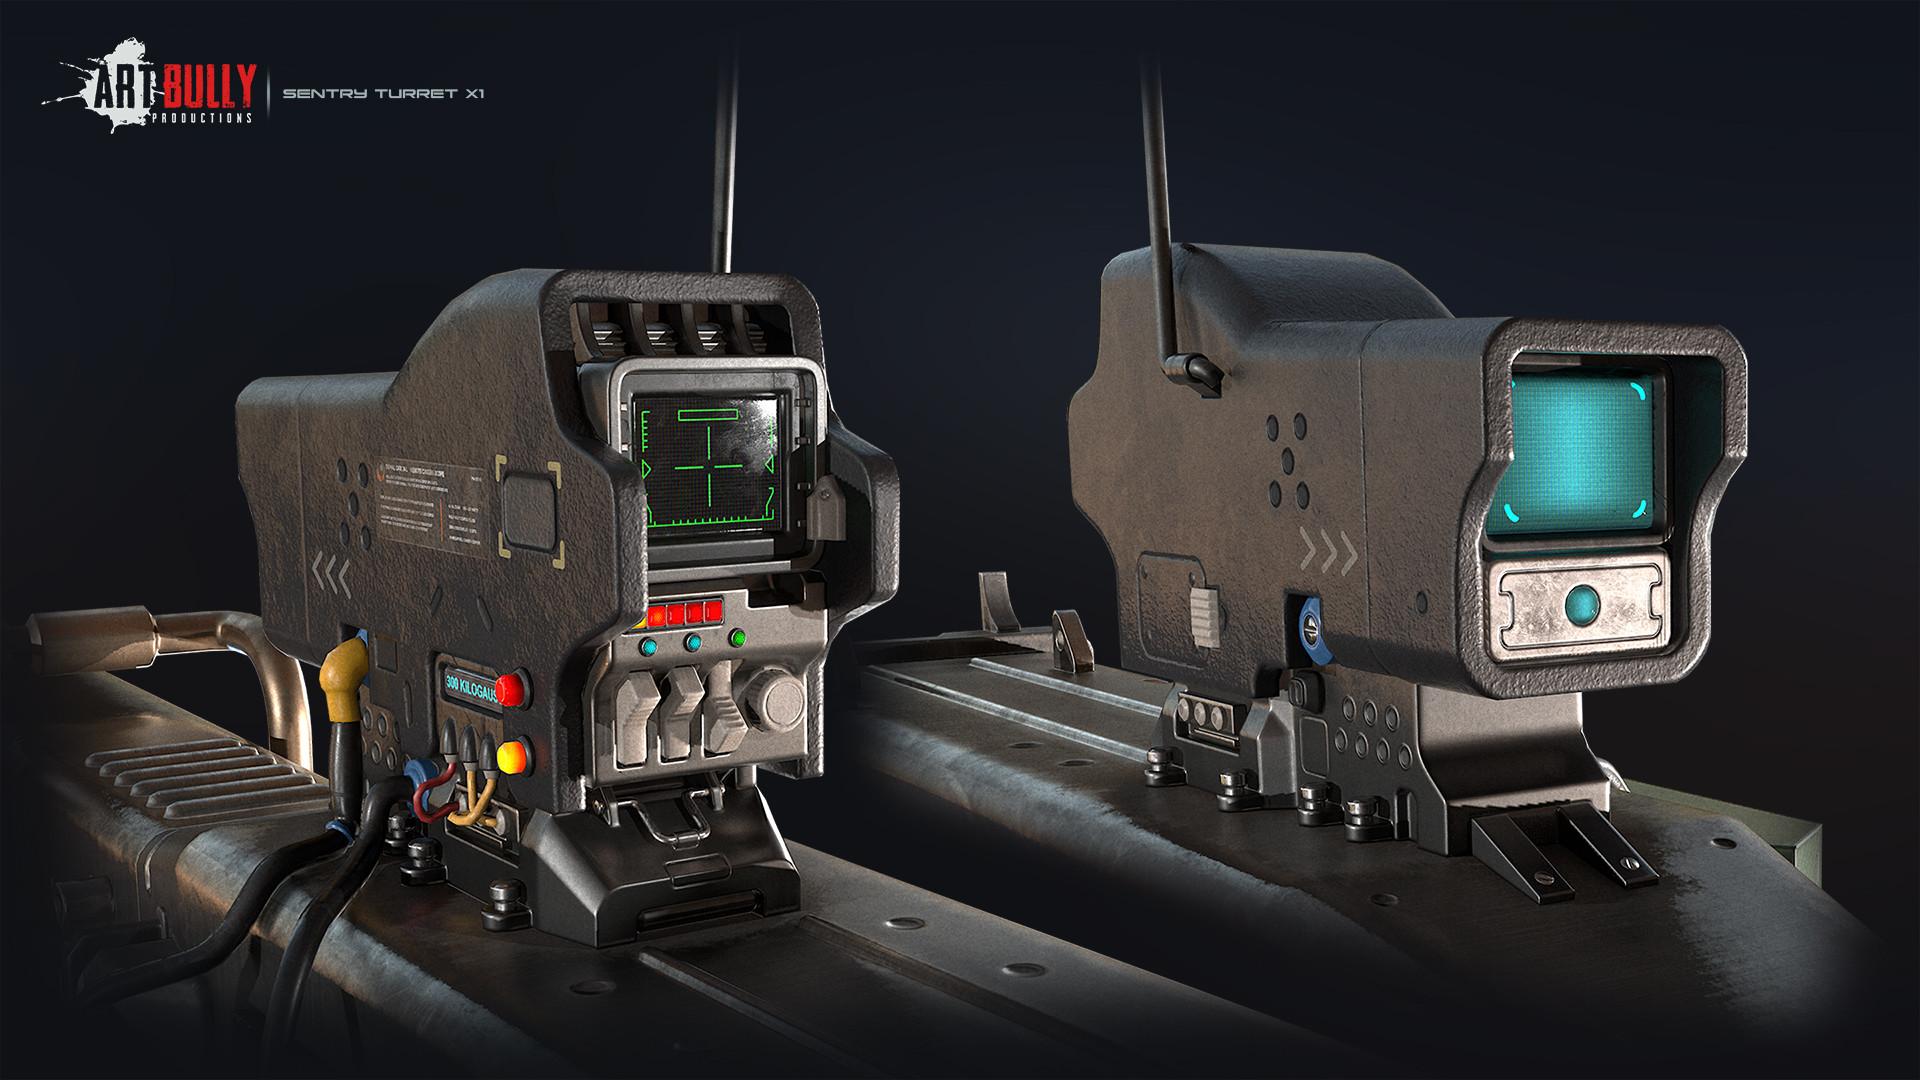 Patrick nuckels sentry turret x1 render 03